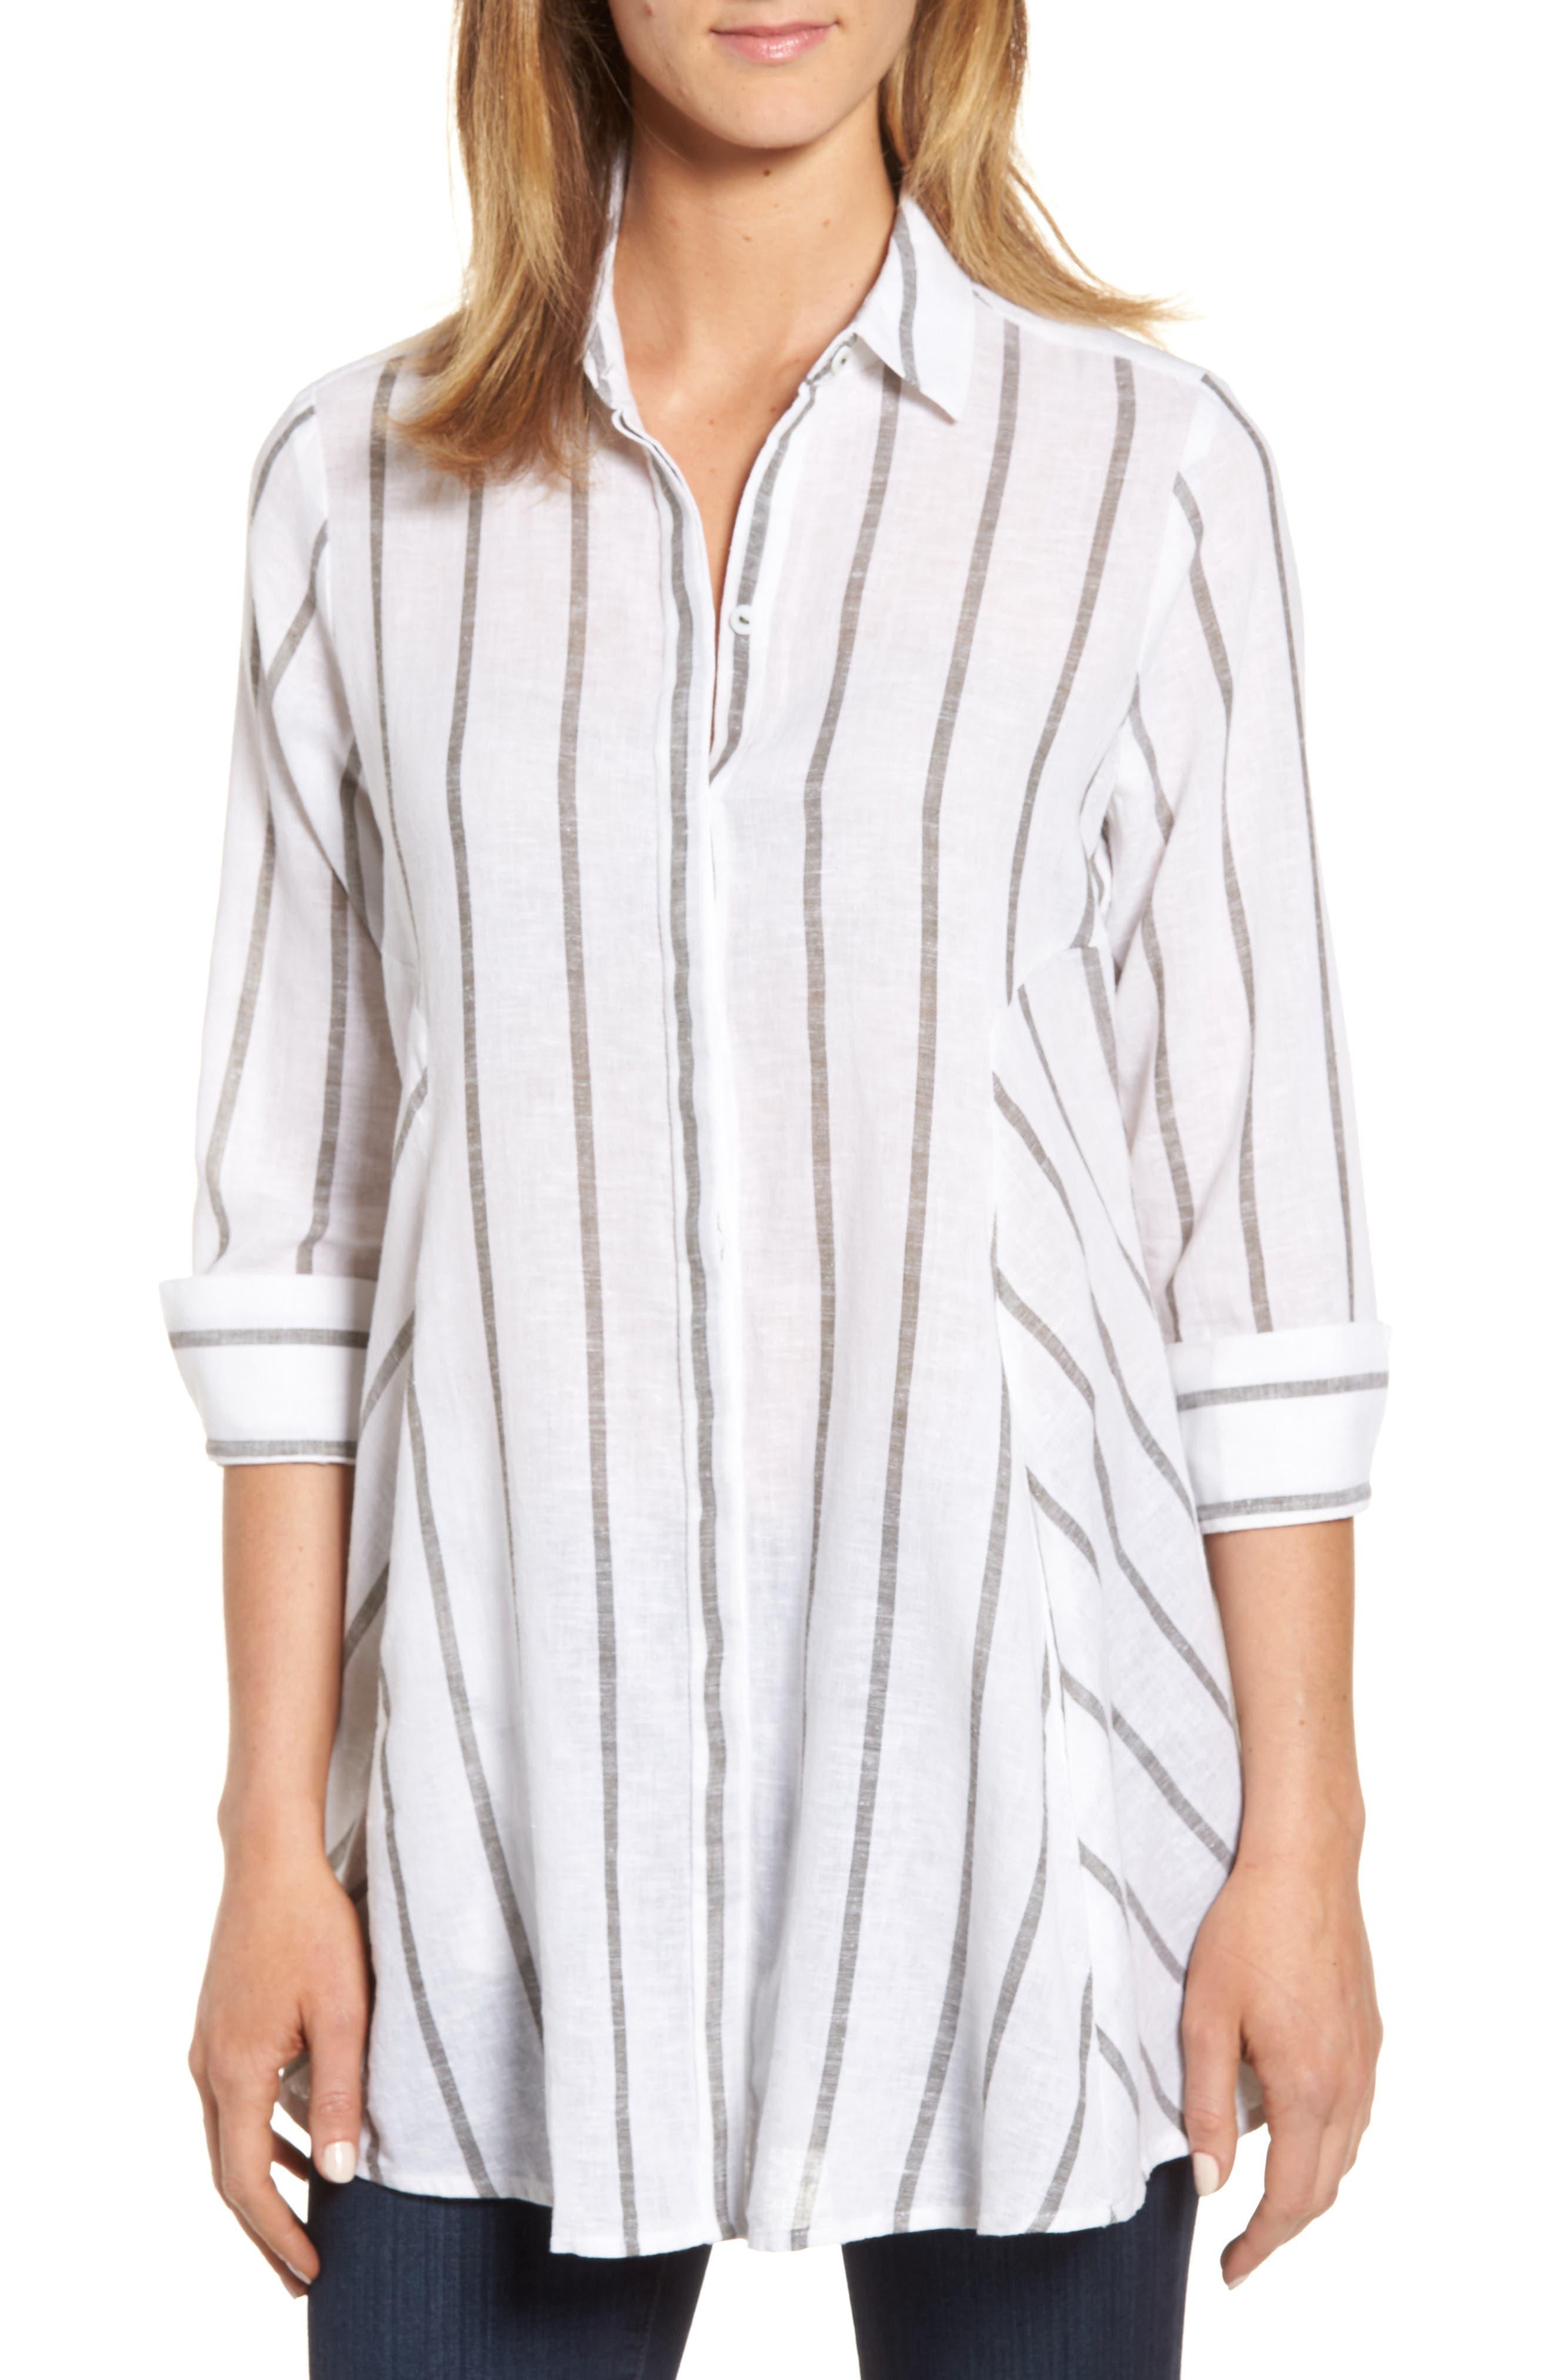 Foxcroft Stripe Tunic Shirt